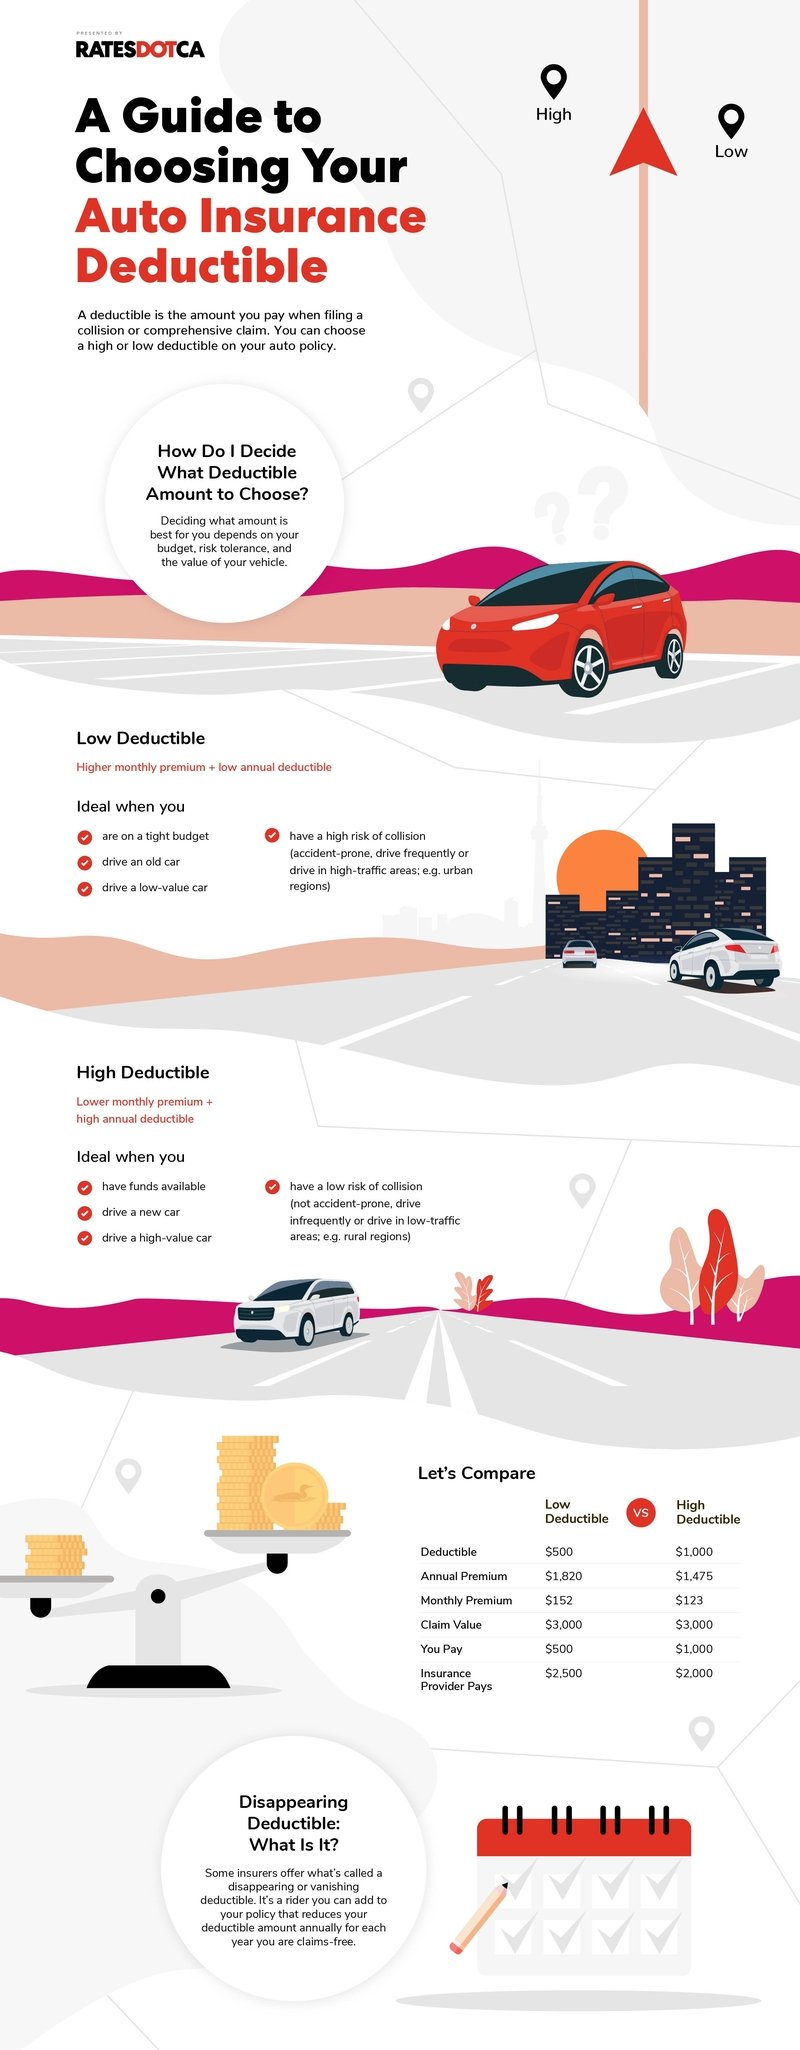 RDOT-057_2021_Deductible Infographic_FINAL.jpg